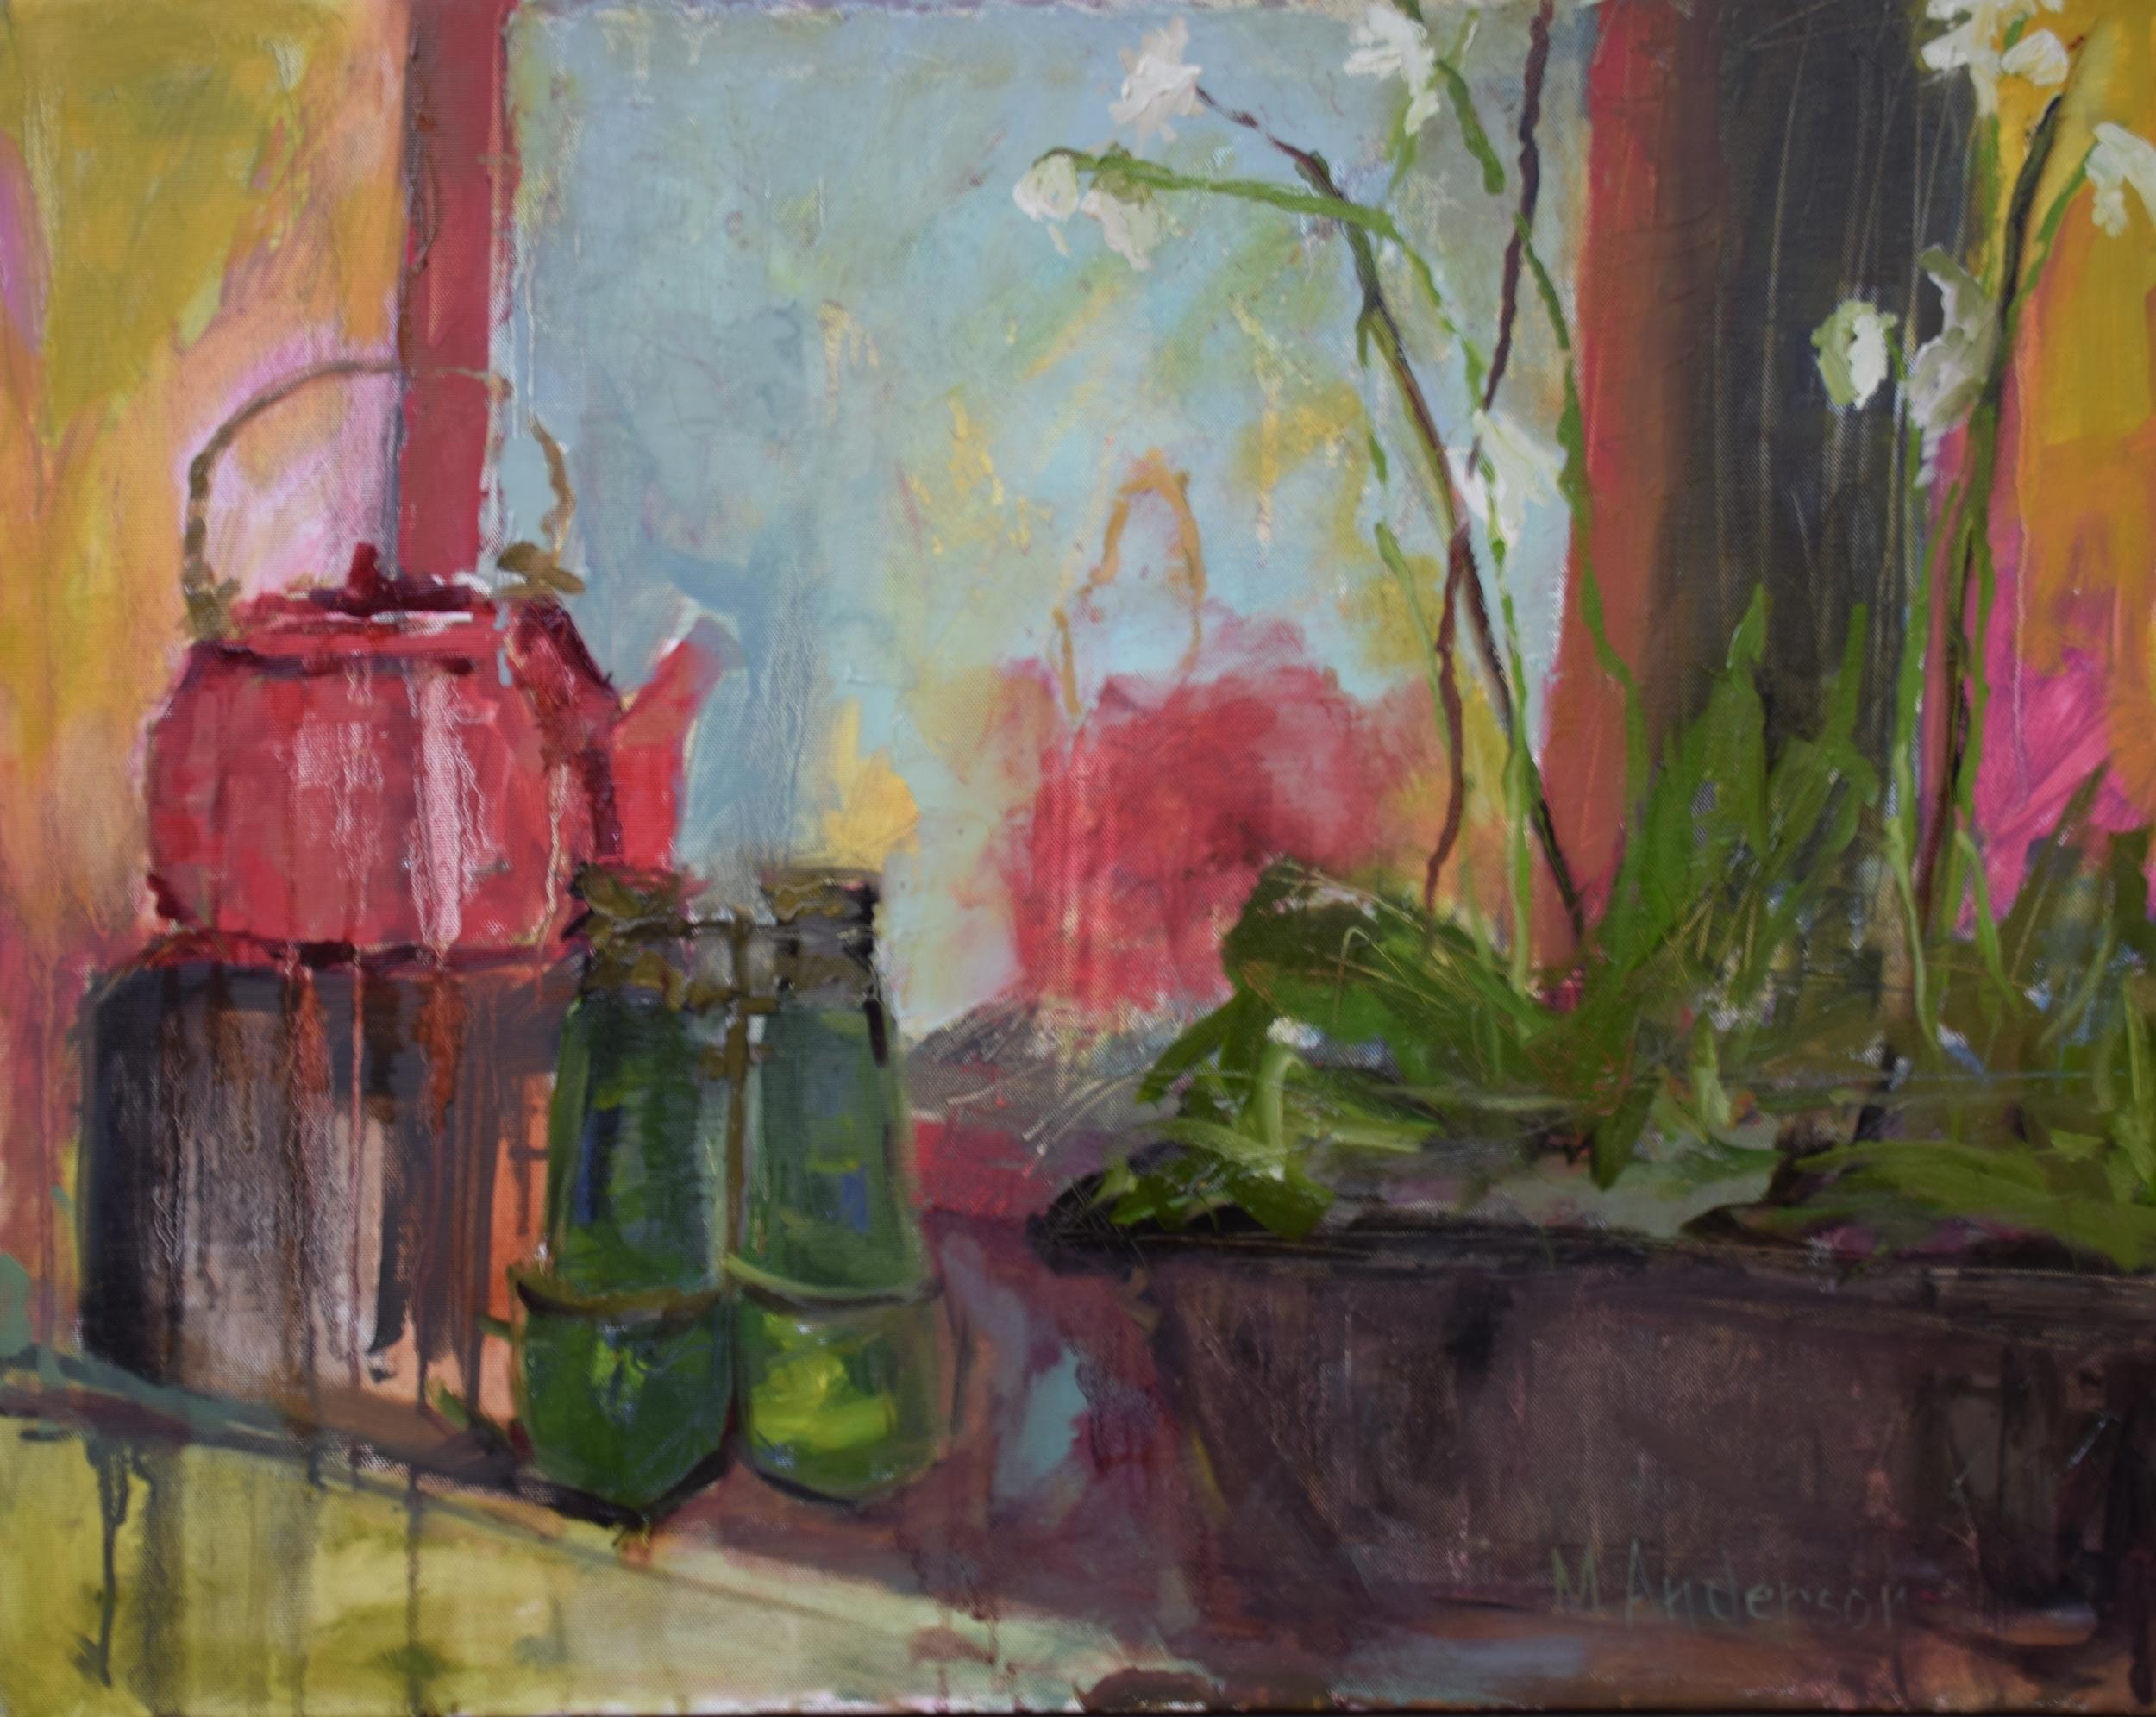 Treasure Table (20x24 Canvas) - Sold